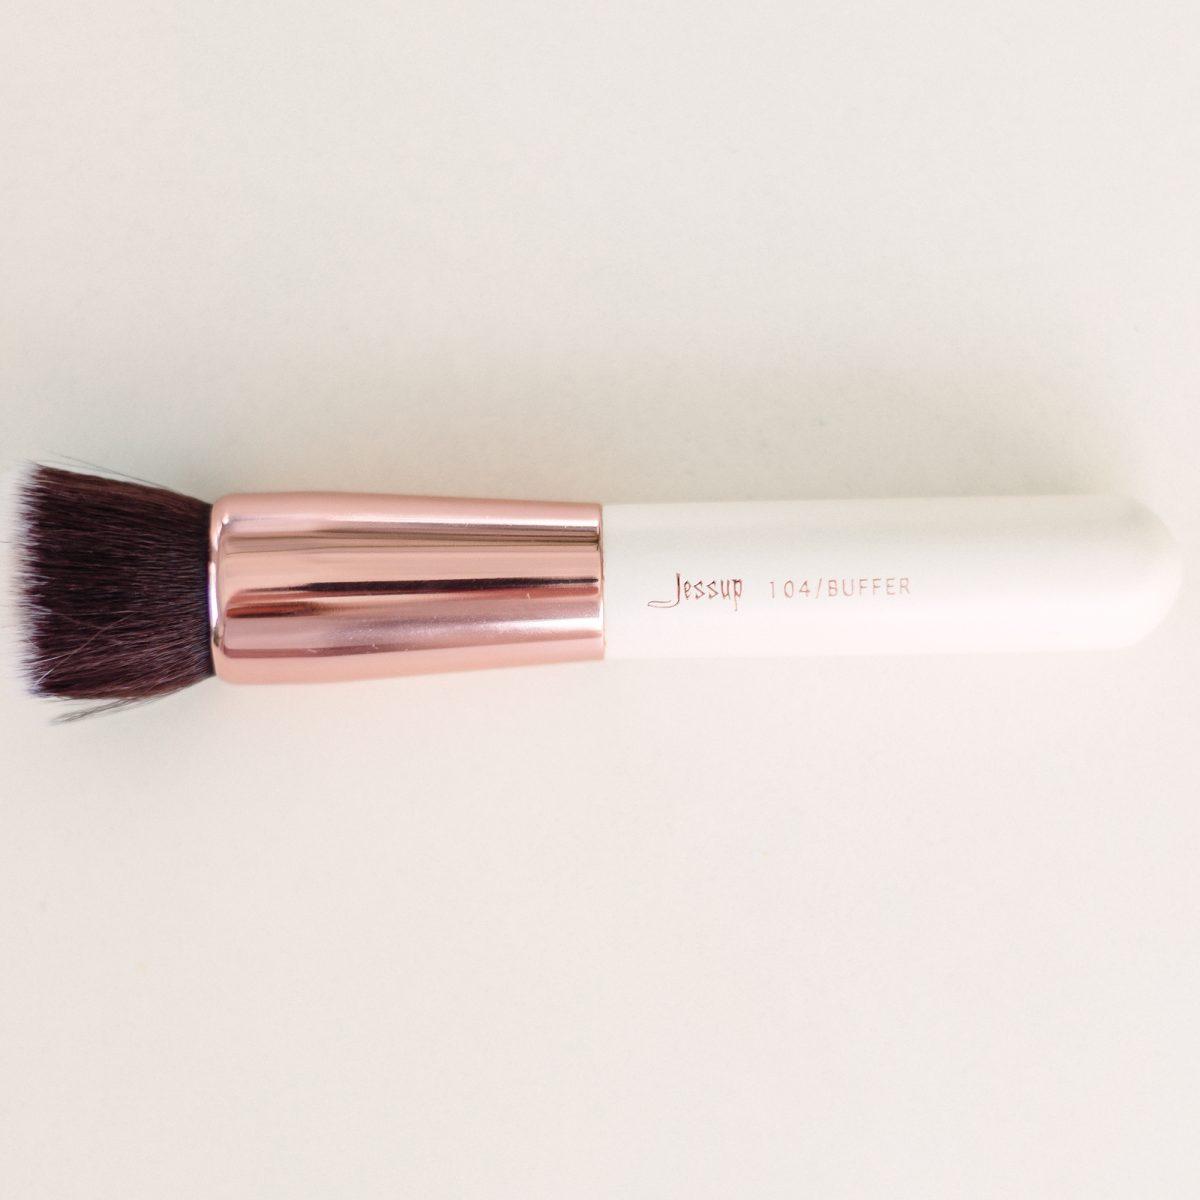 Makeup Brushes Guide - Jessup 104 Buffer Brush